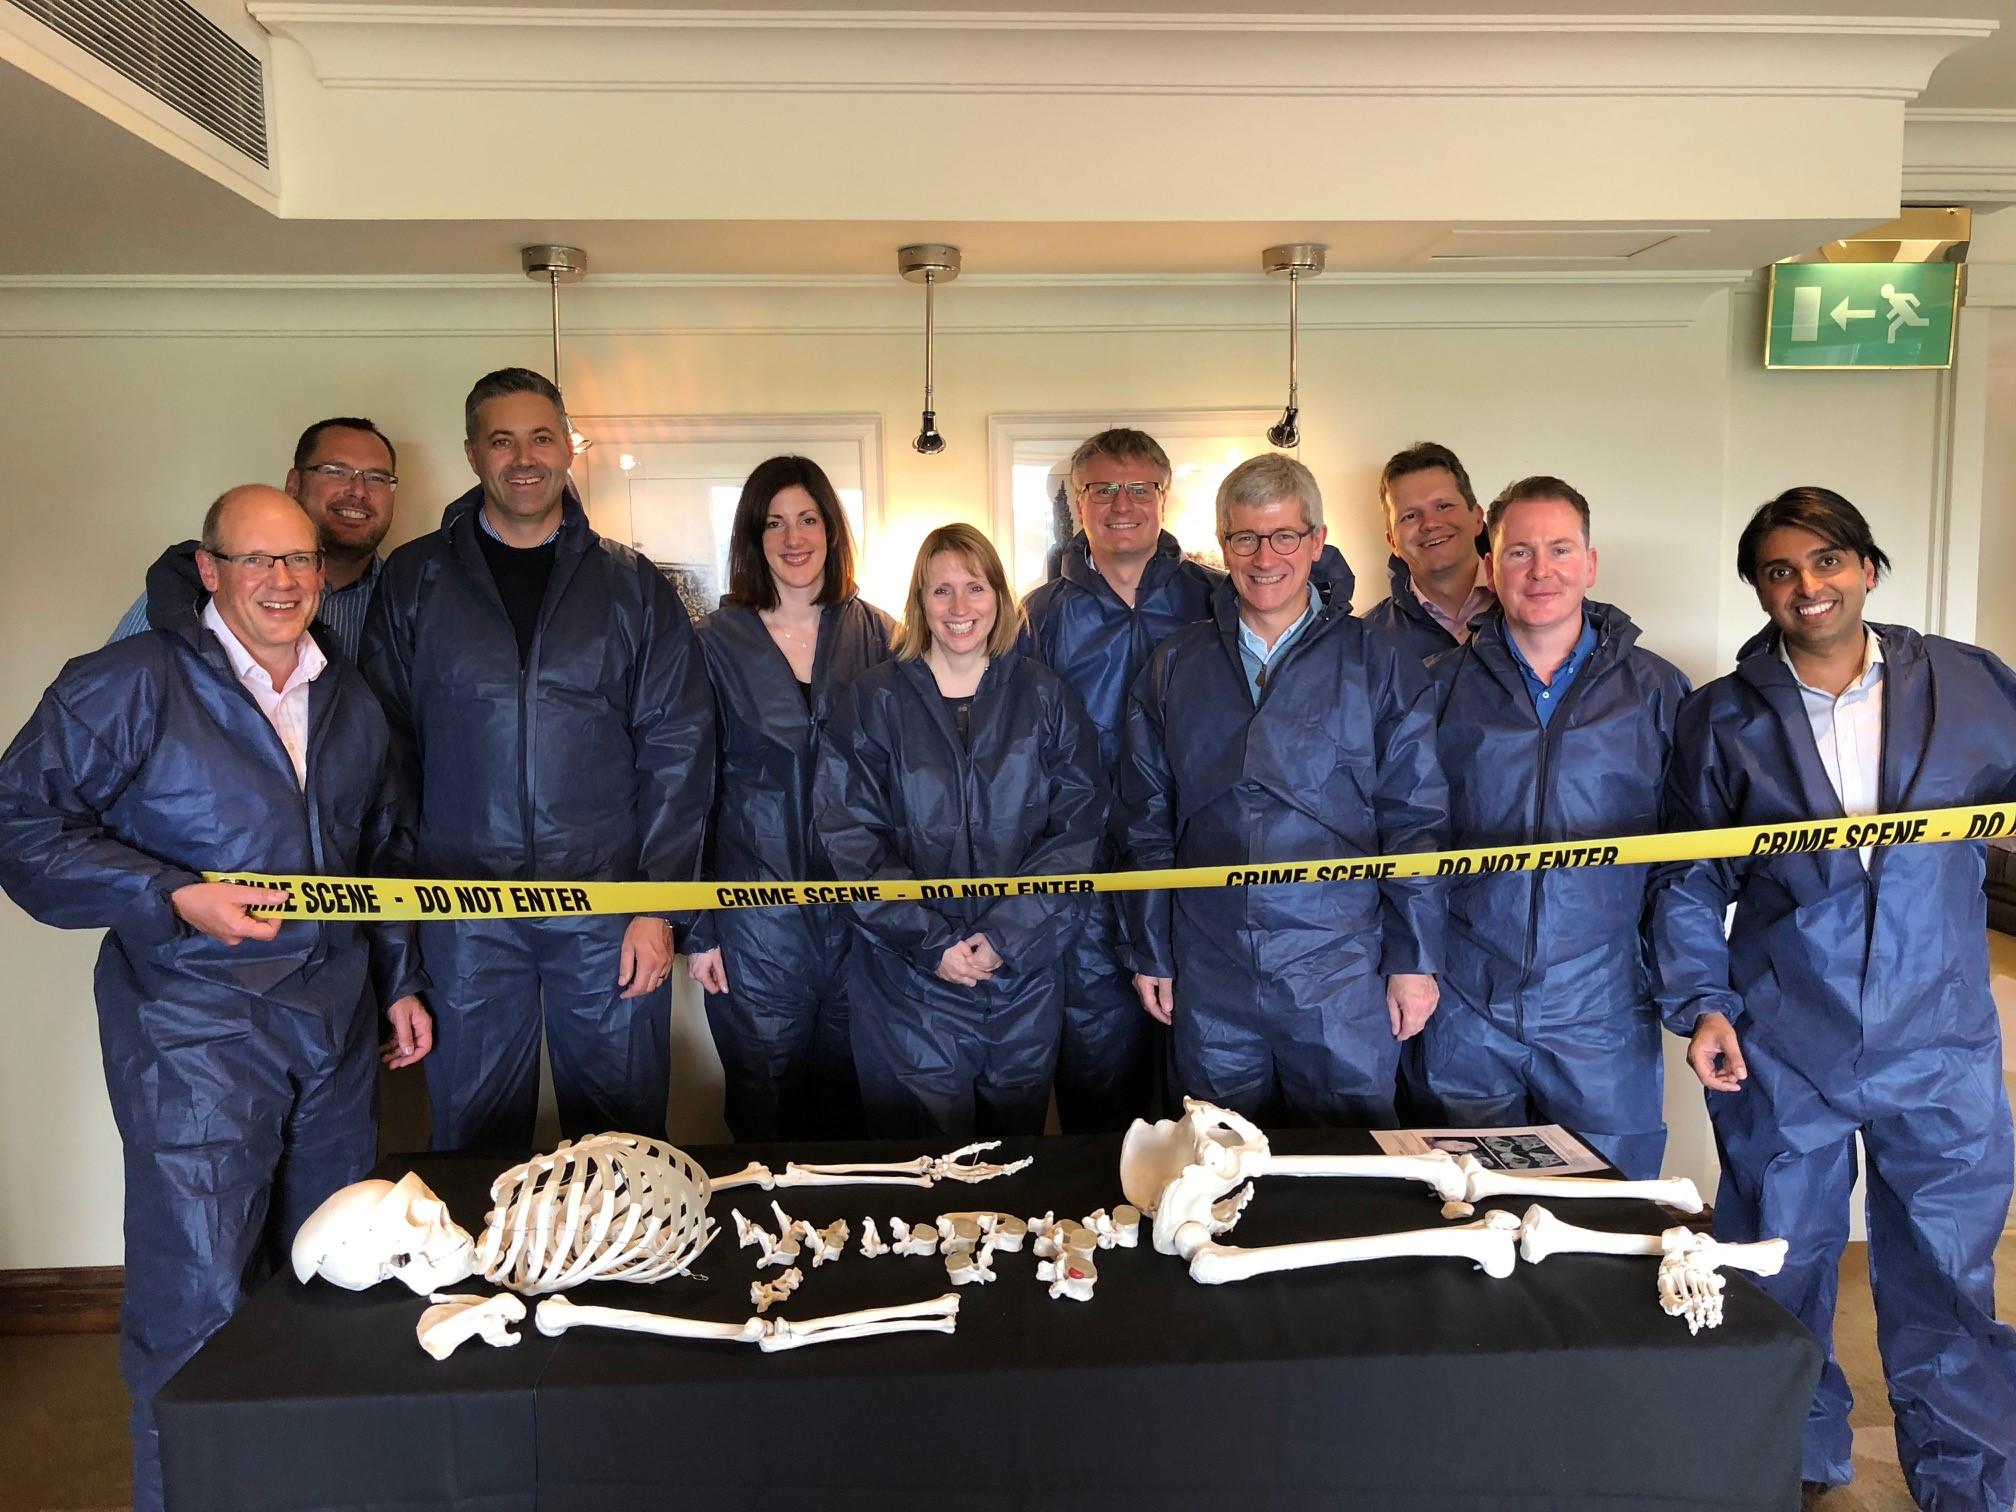 CSI Training and Events - PWC Team photo at a CSI Team building event